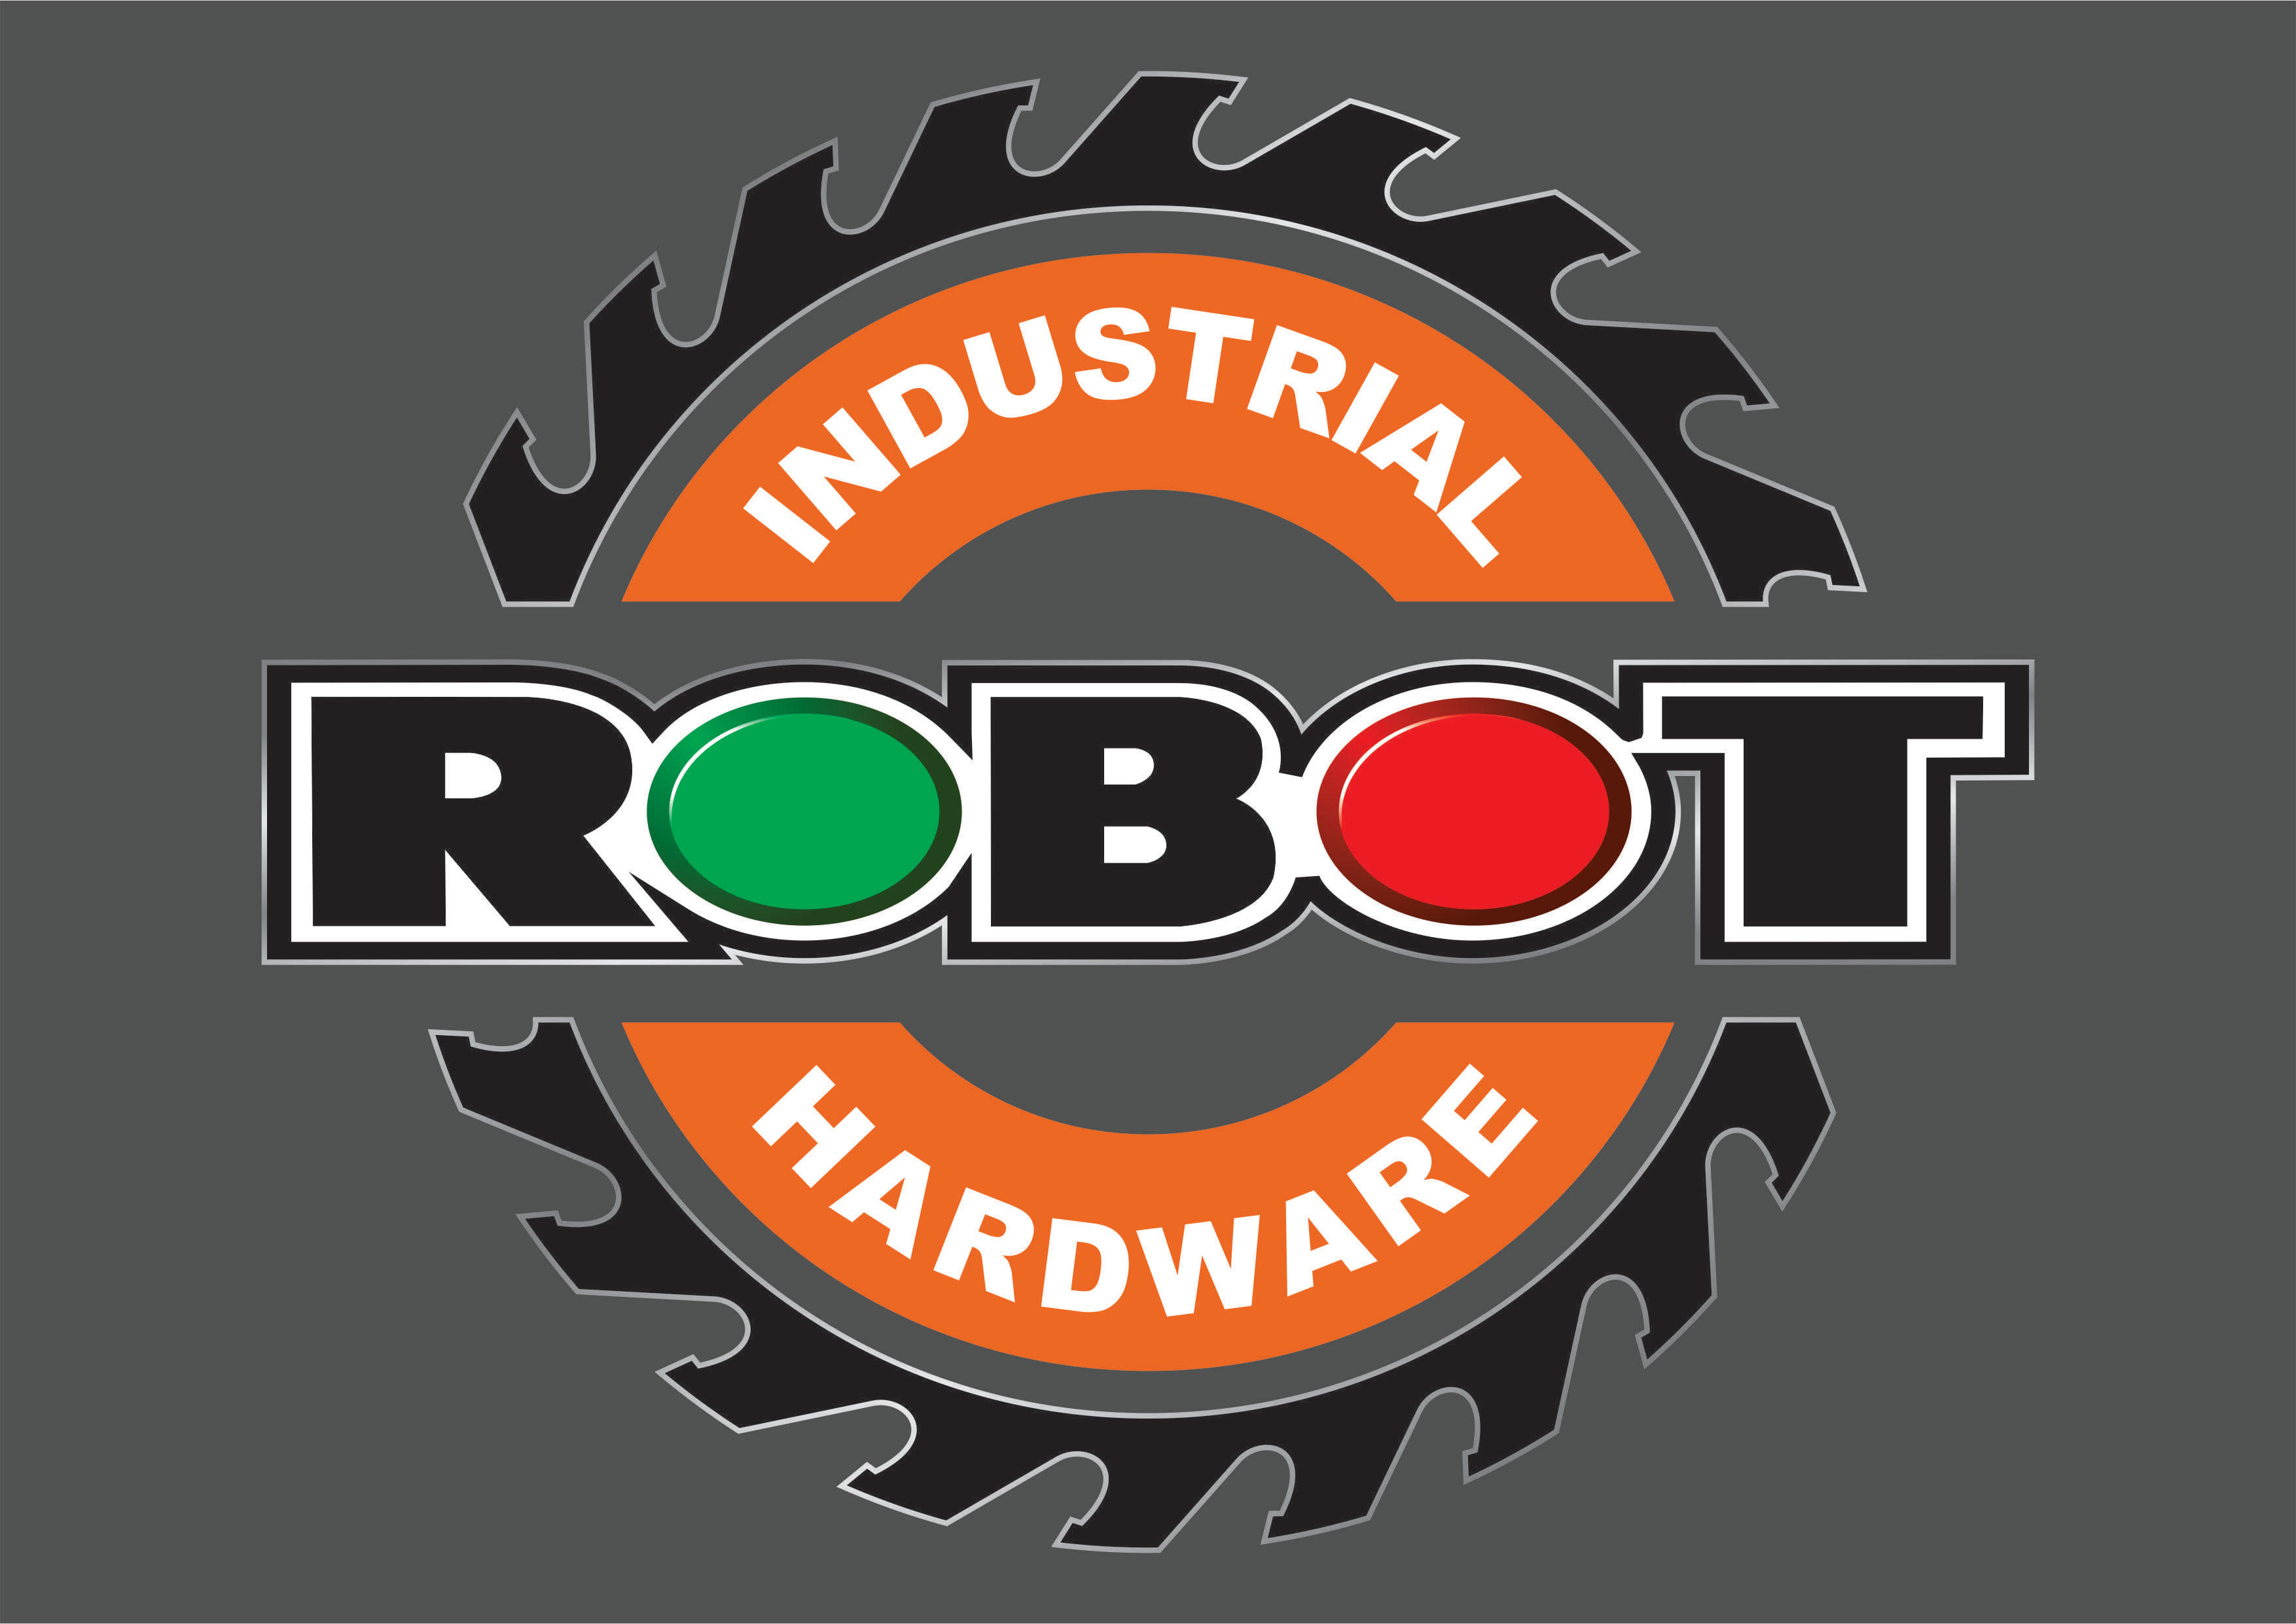 Robot Industrial Supplies